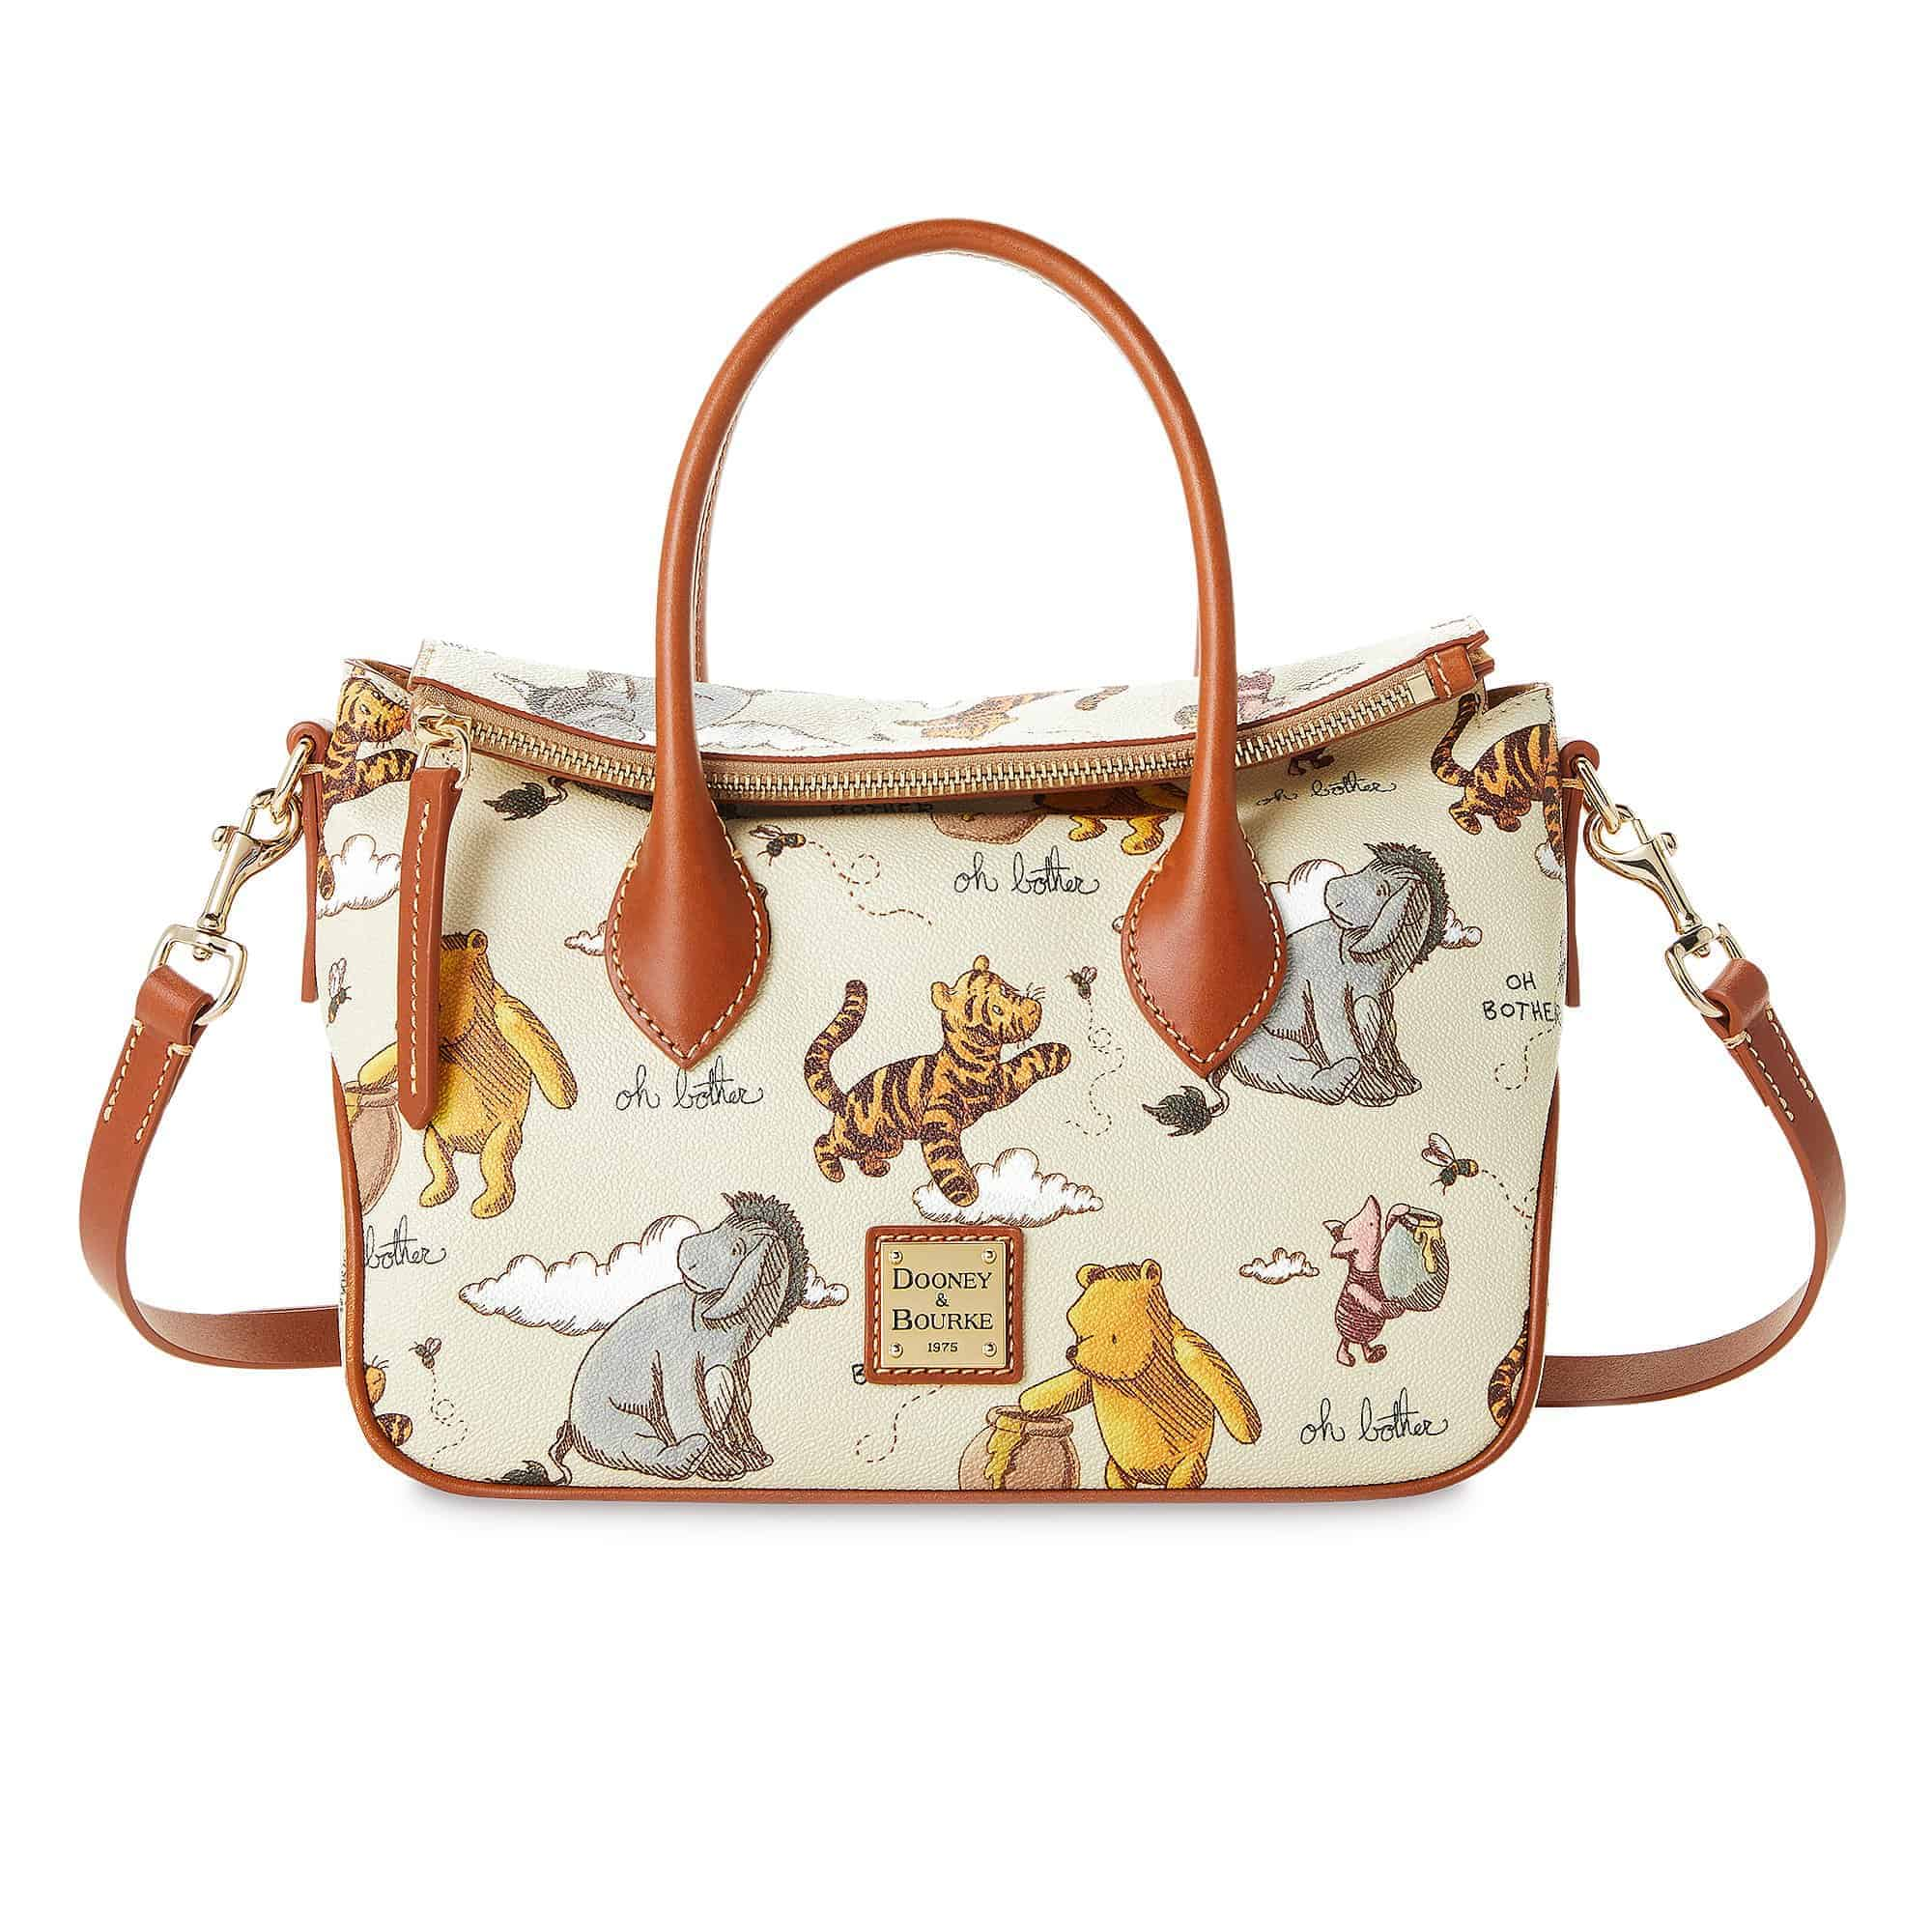 Classic Winnie the Pooh Satchel by Dooney & Bourke